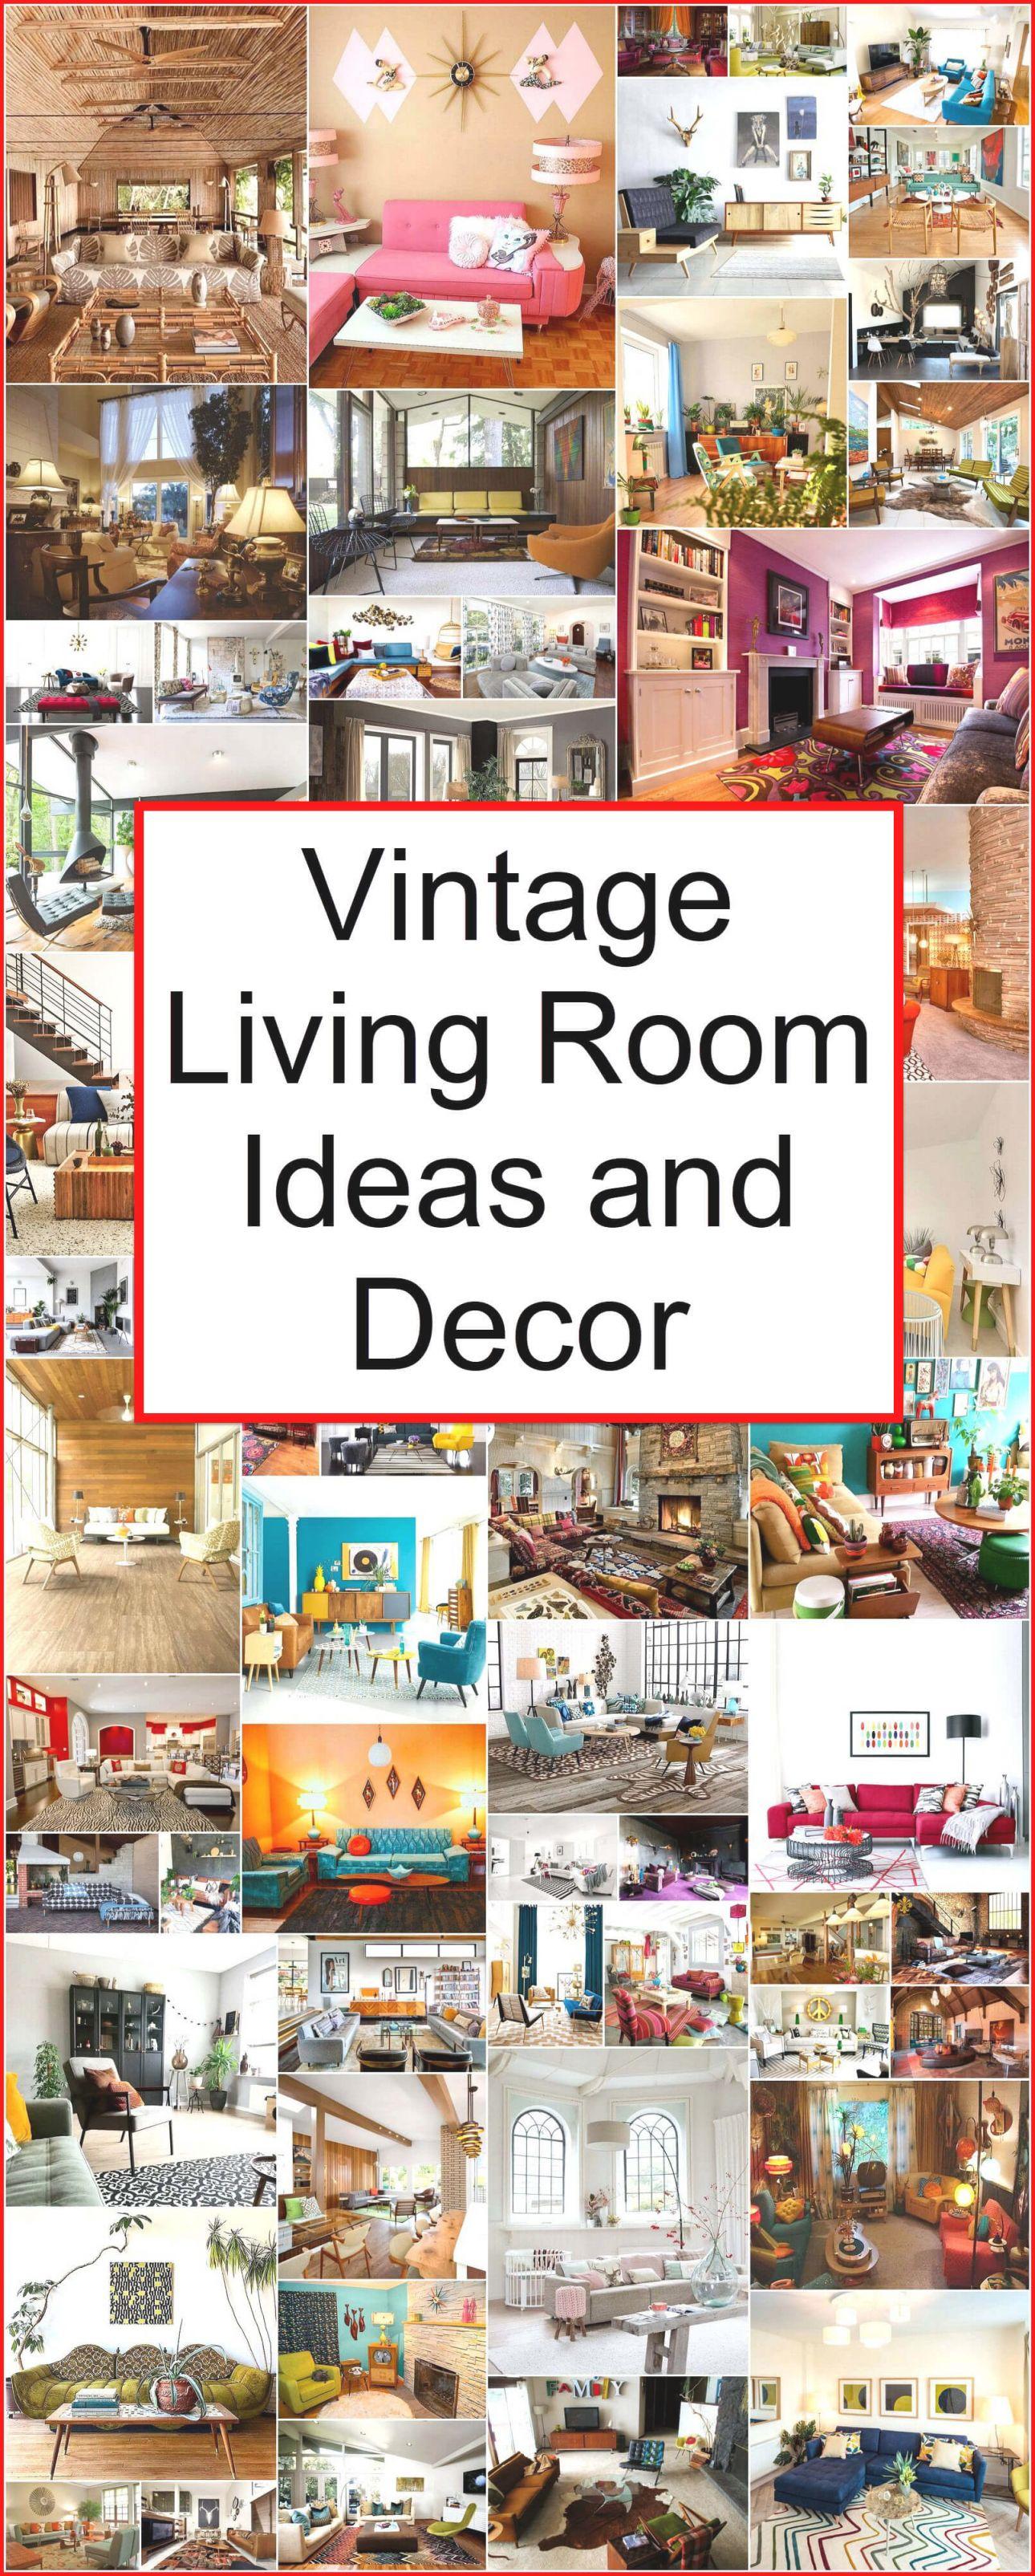 Vintage Living Room Ideas And Decor | Retro Vintage Style within Retro Living Room Decor